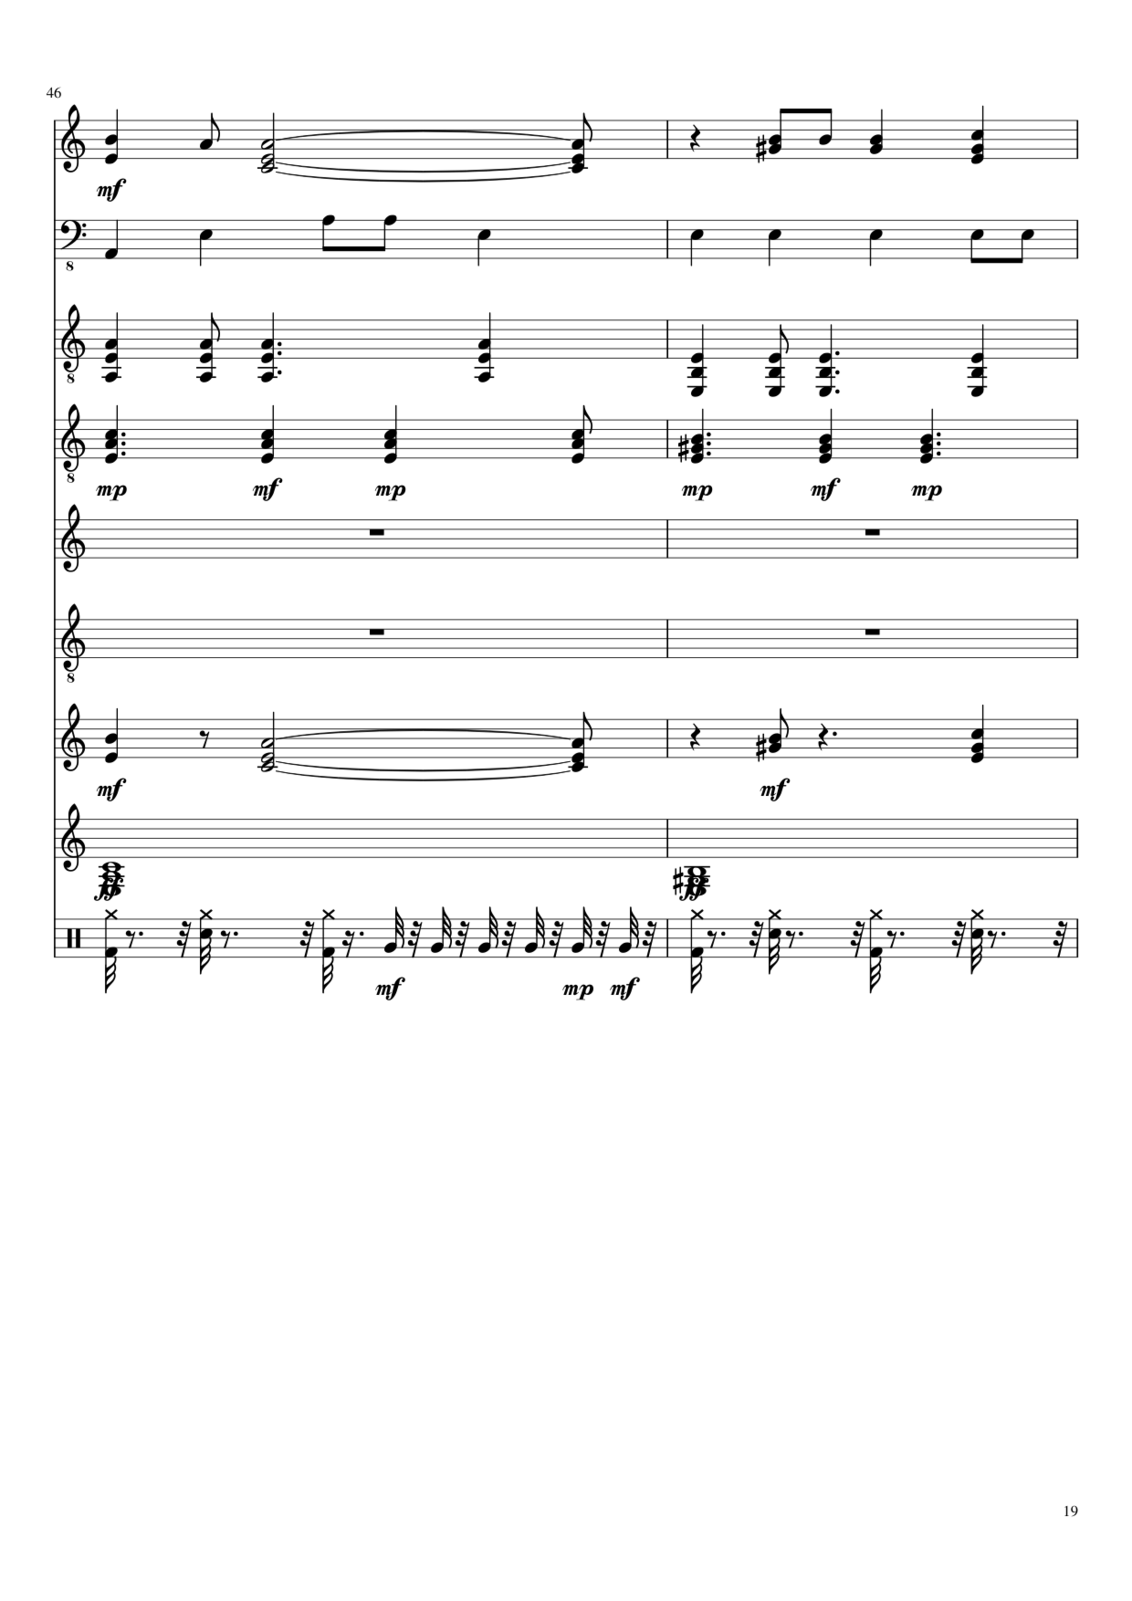 Mrs. Vandebilt slide, Image 19